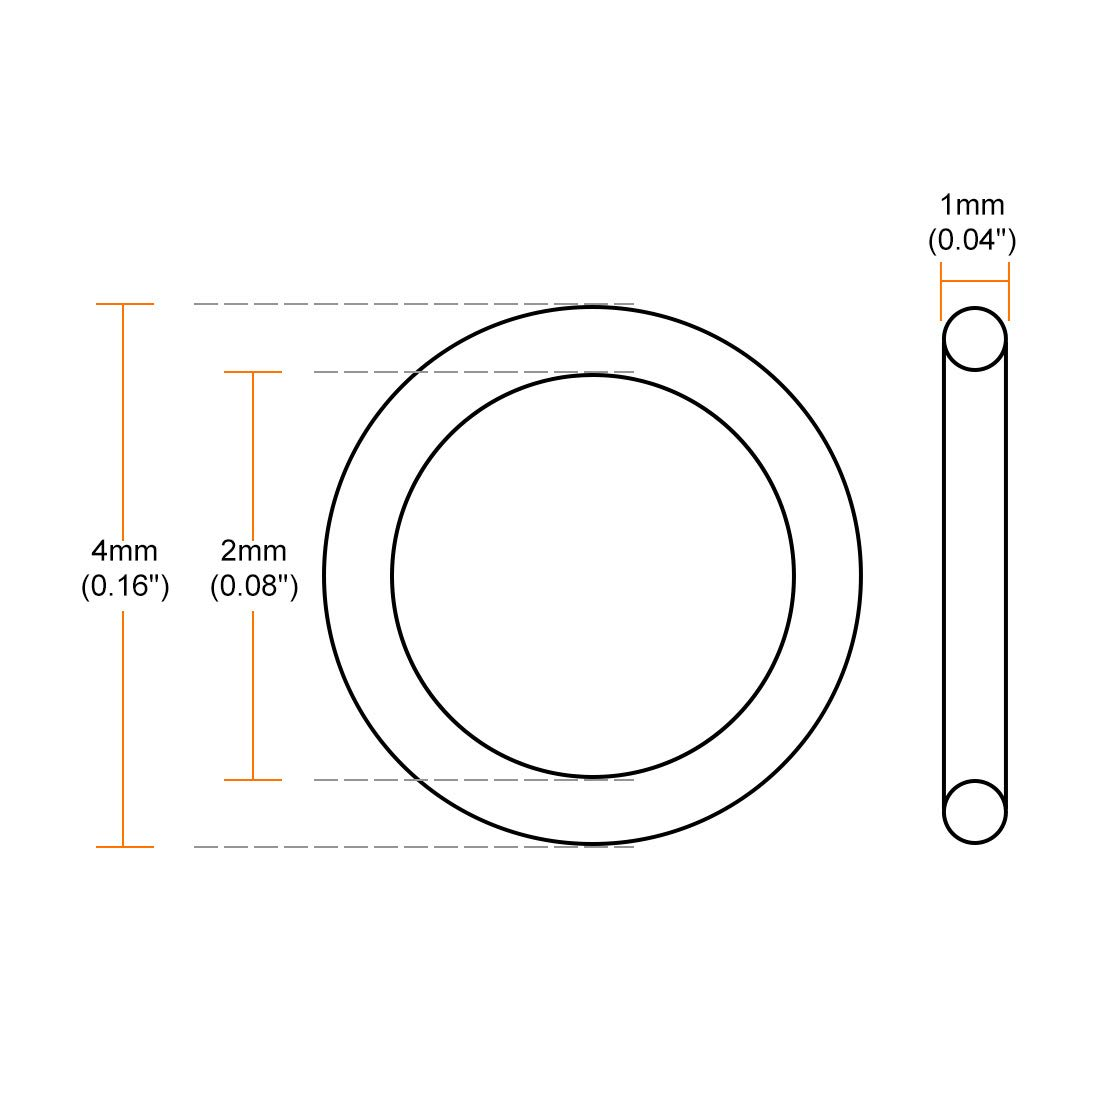 2mm Inner Diameter 4mm OD uxcell Fluorine Rubber O Rings 1mm Width Seal Gasket Green 20Pcs